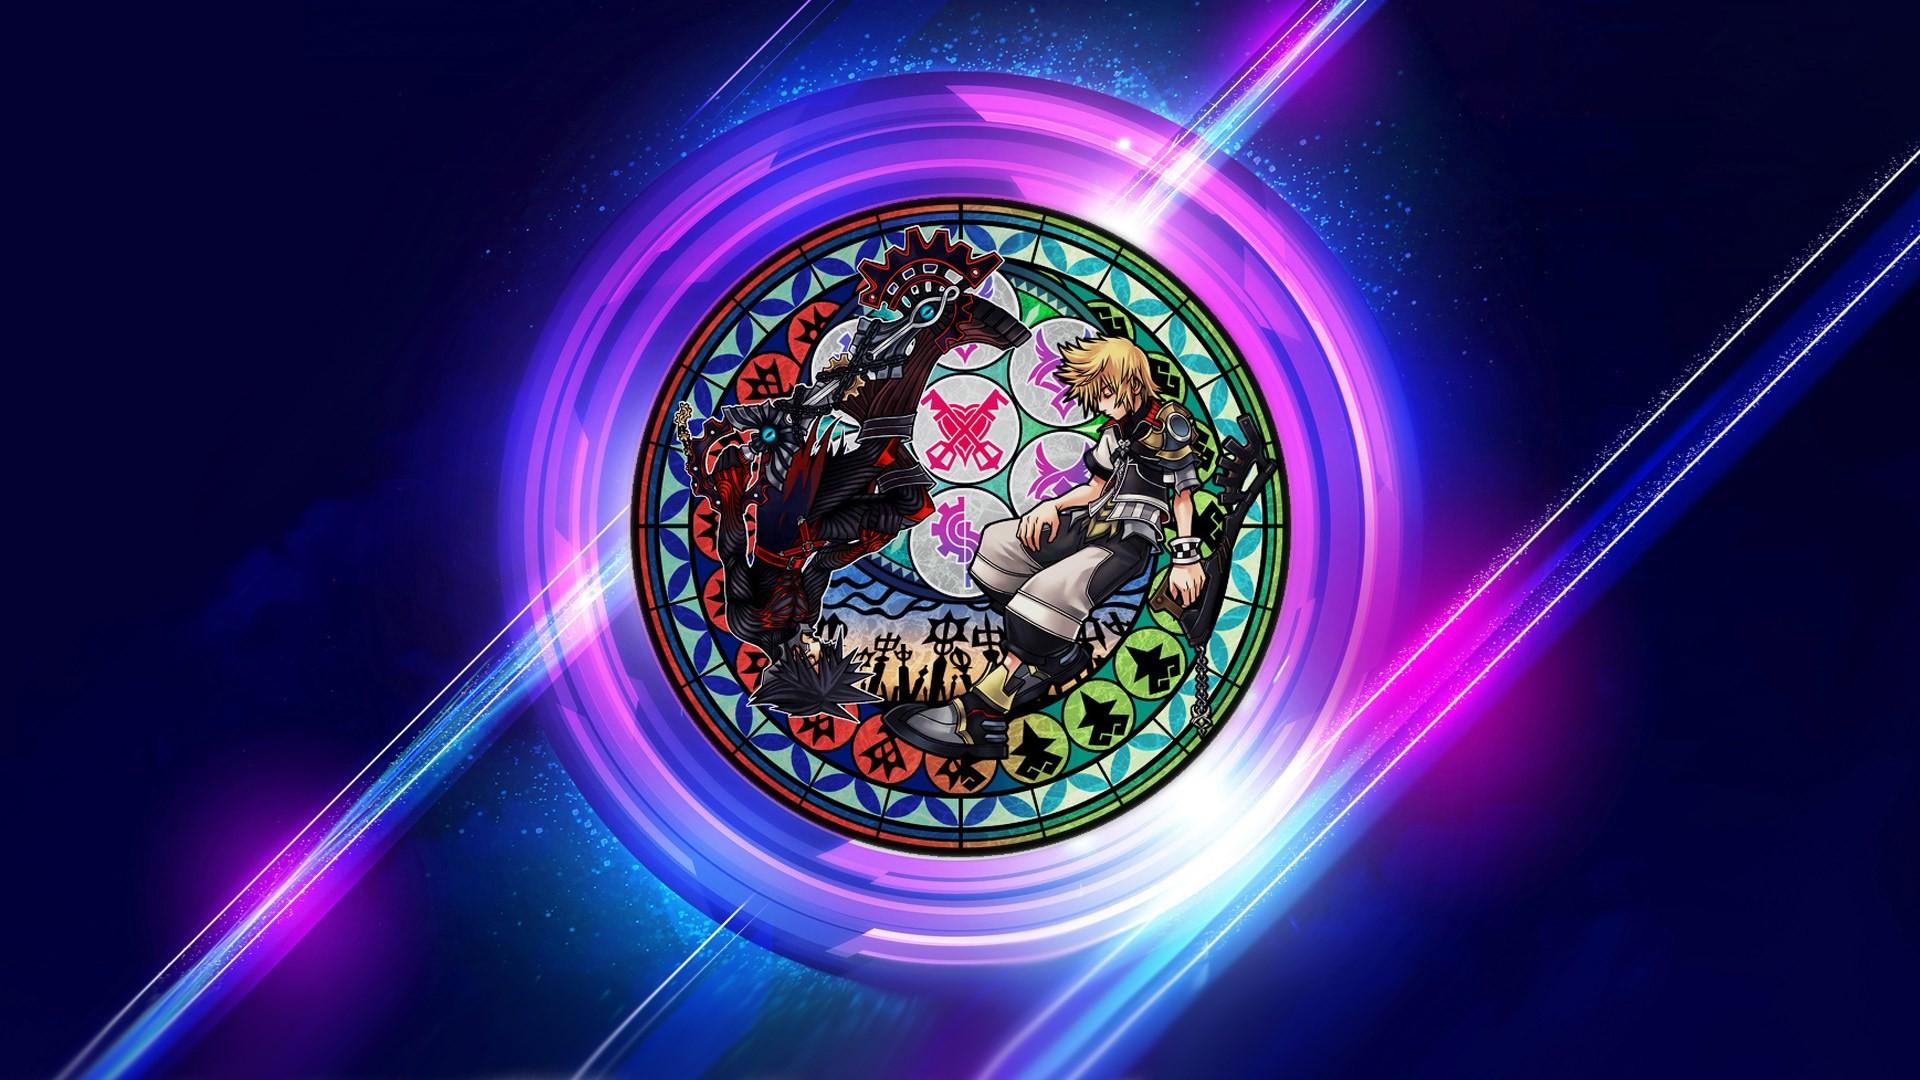 Kingdom Hearts Desktop Backgrounds – Wallpaper Cave